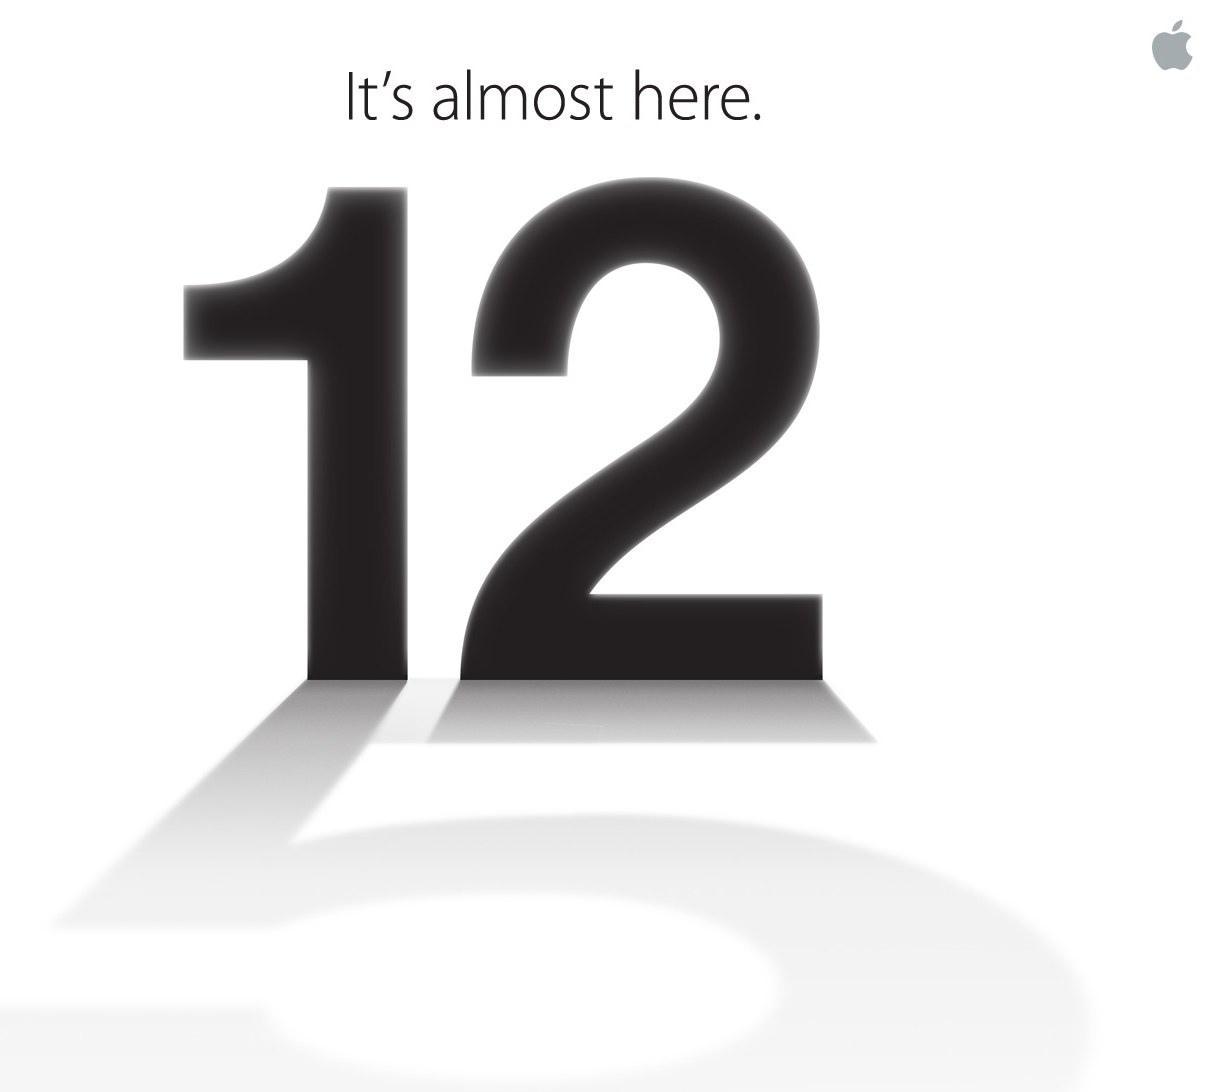 iPhone 5 發表邀請